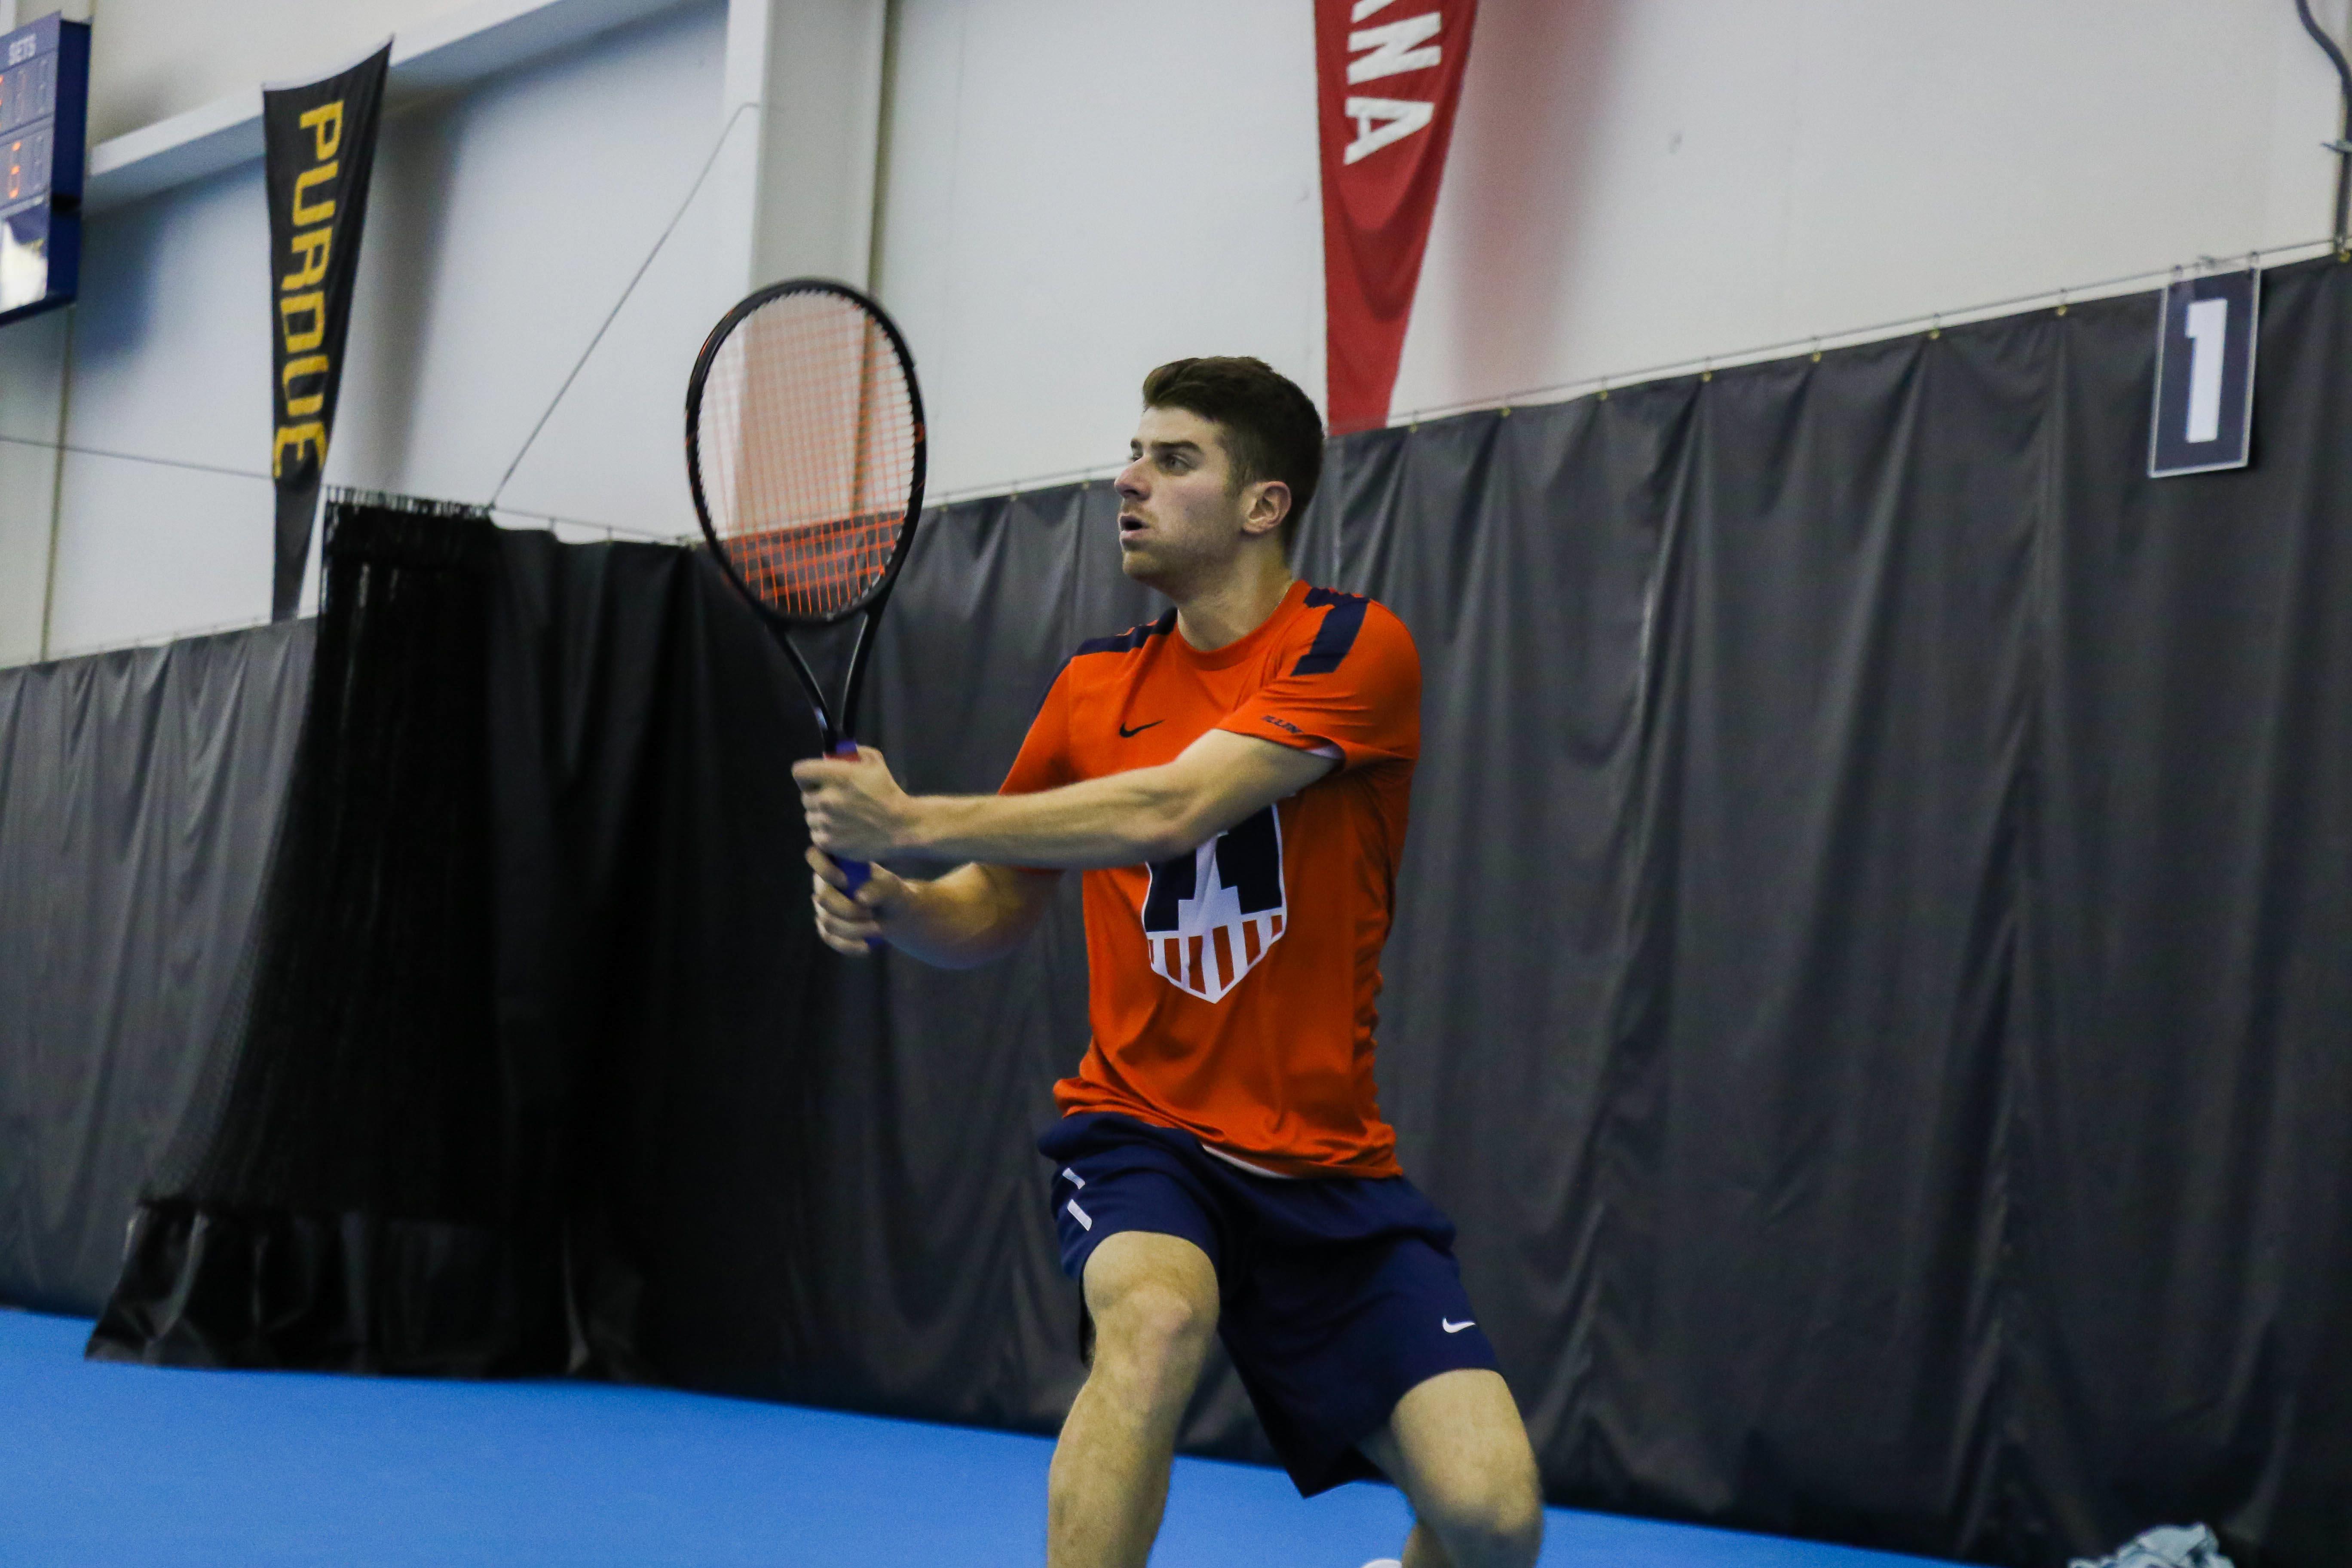 Illinois' Aron Hiltzik follows through on a swing in the meet against University of Kentucky on Friday, Feb. 24 at the Atkins Tennis Center in Urbana.